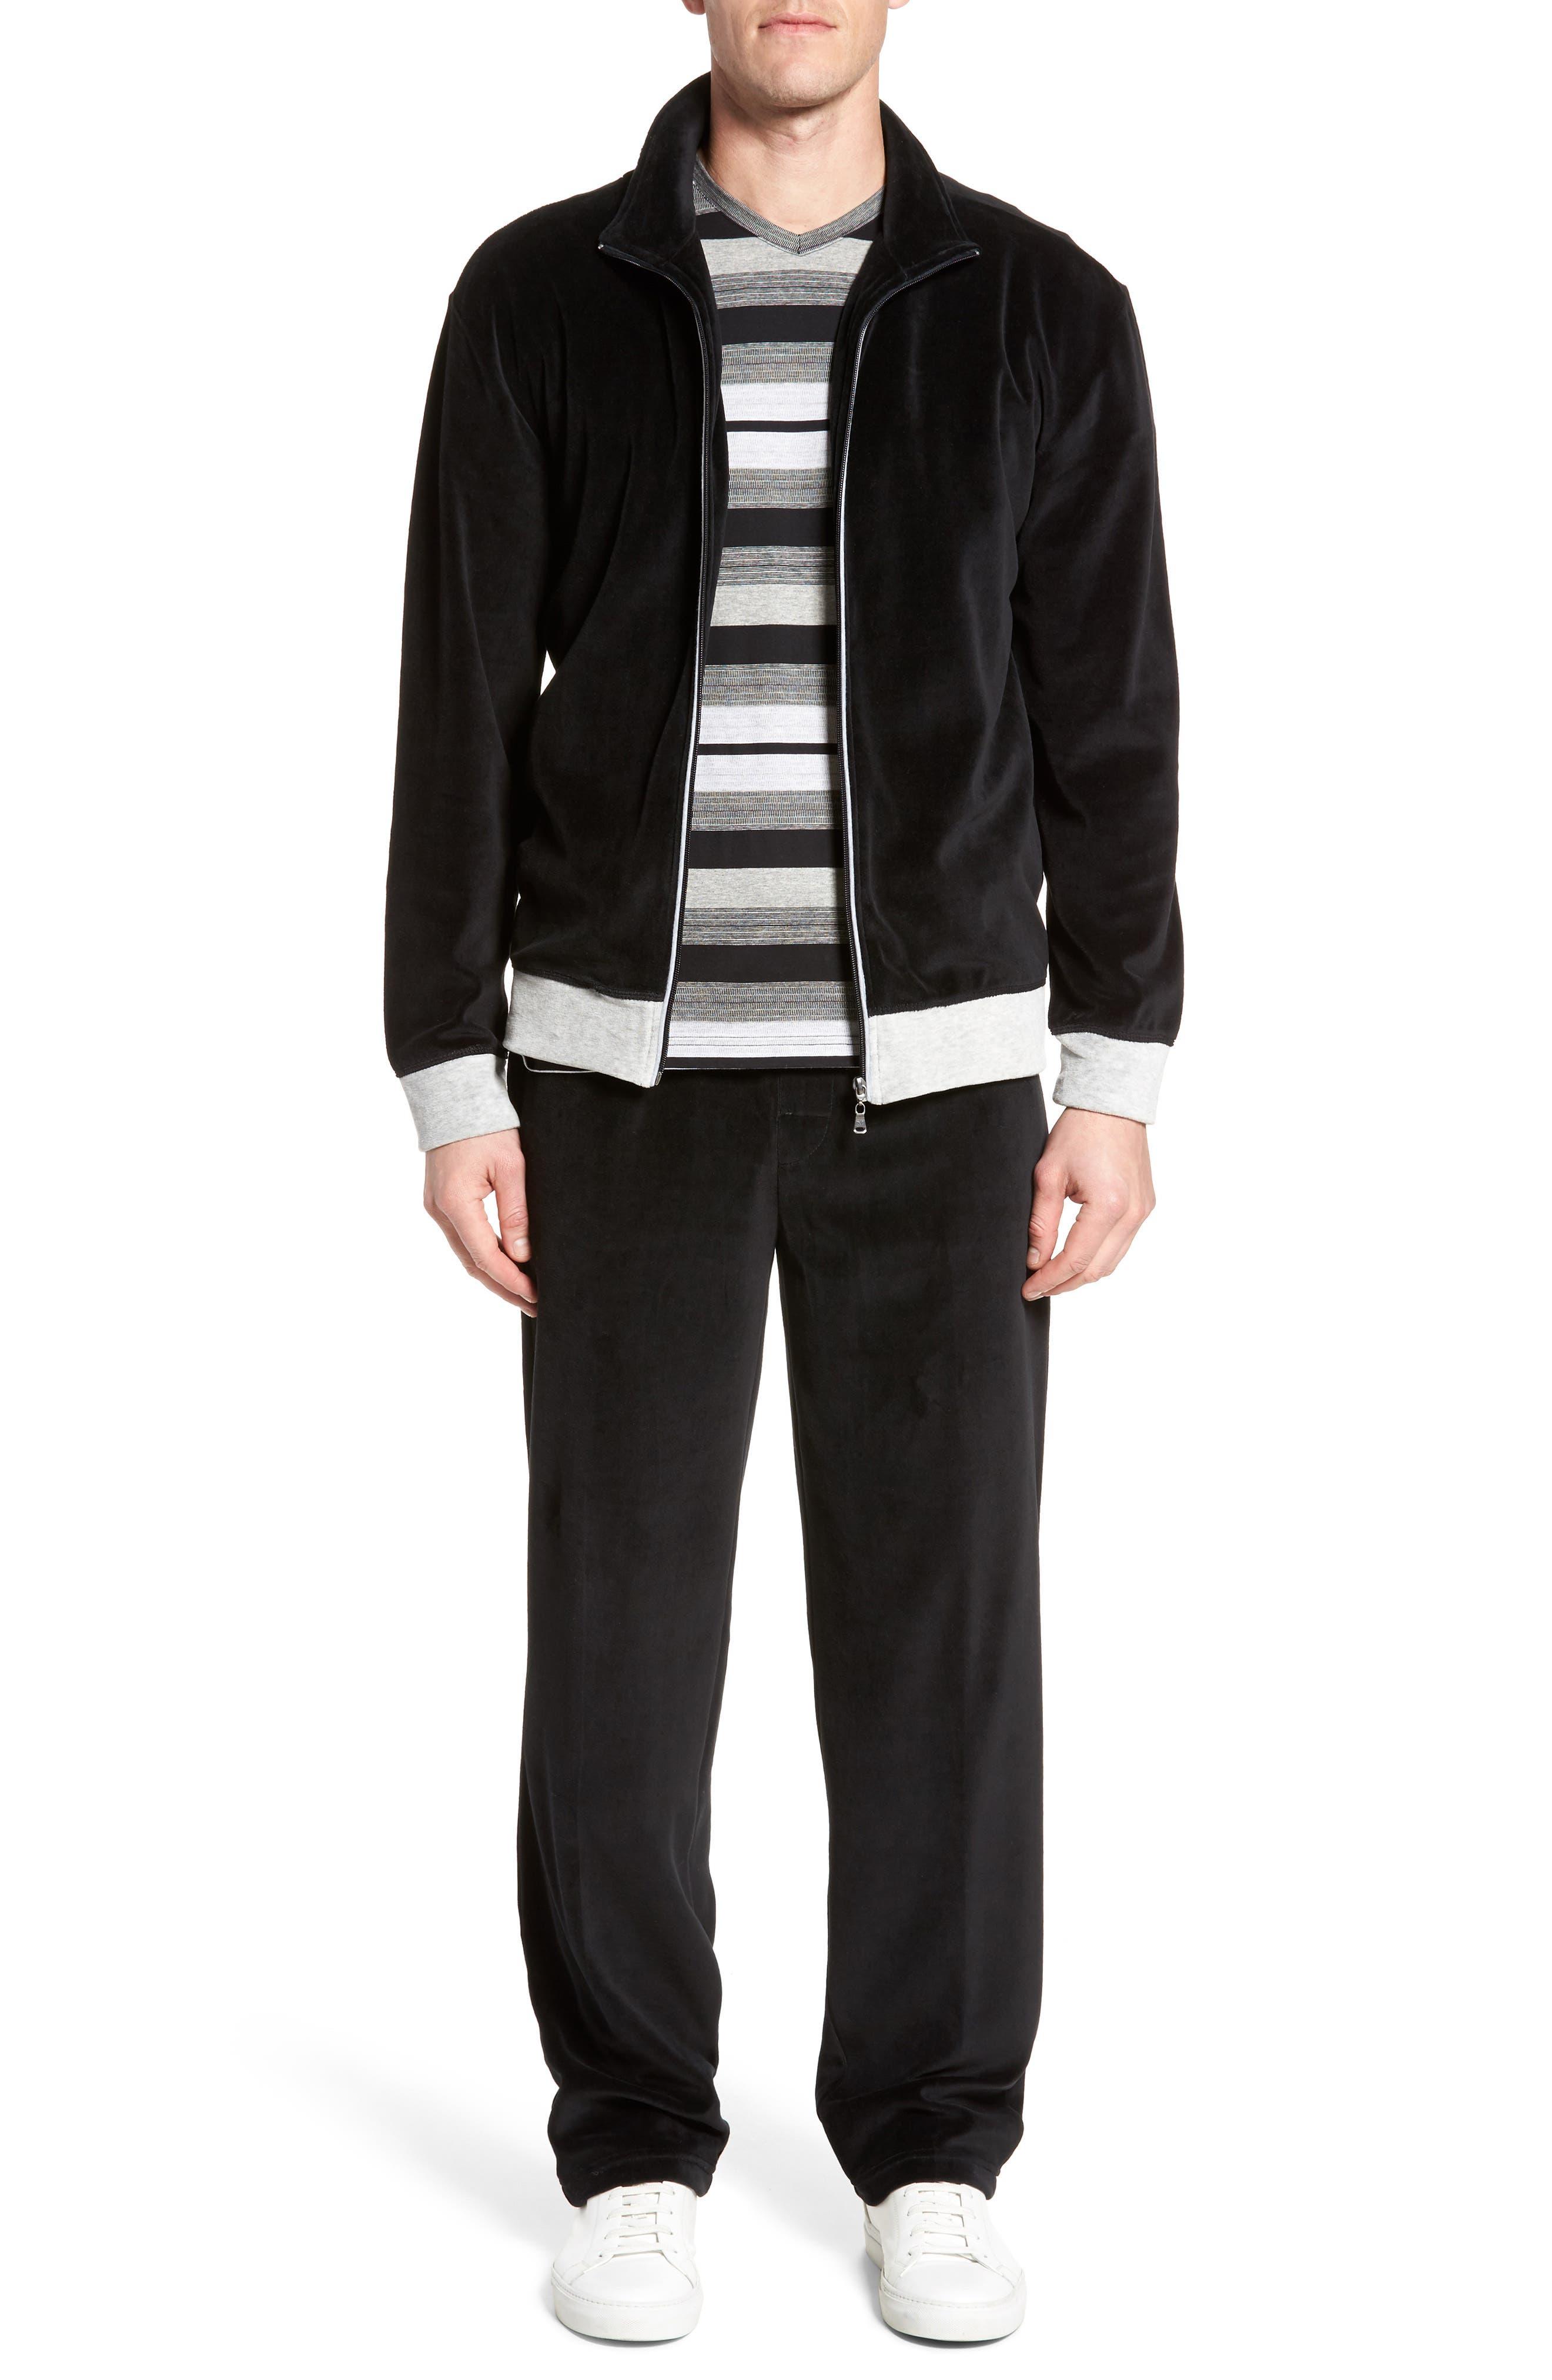 Strathcona Velour Warm-Up Suit,                             Main thumbnail 1, color,                             001